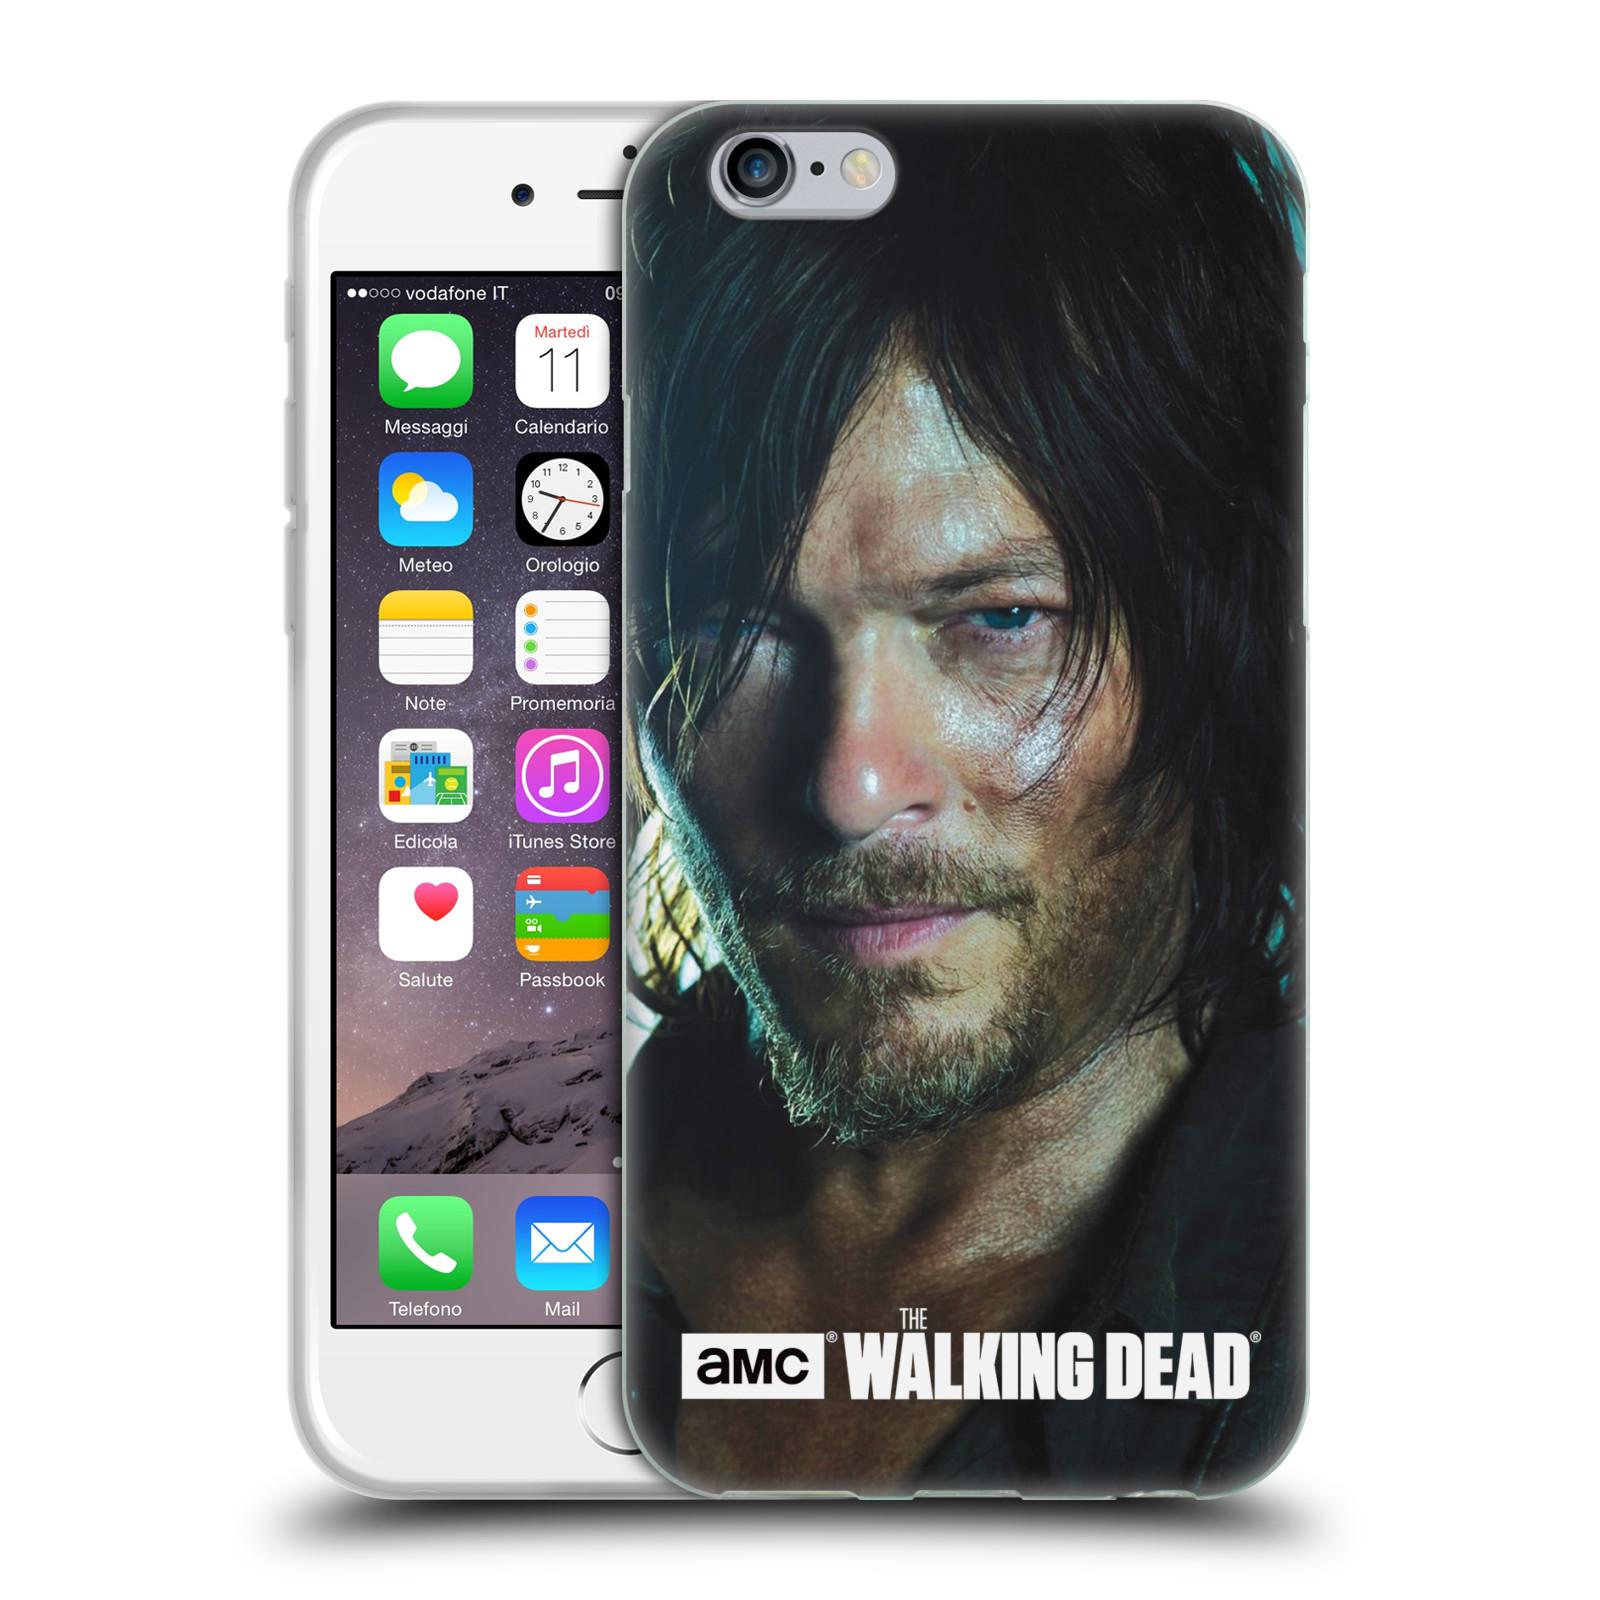 HEAD CASE silikonový obal na mobil Apple Iphone 6 / 6S originální potisk Walking Dead postavy Daryl